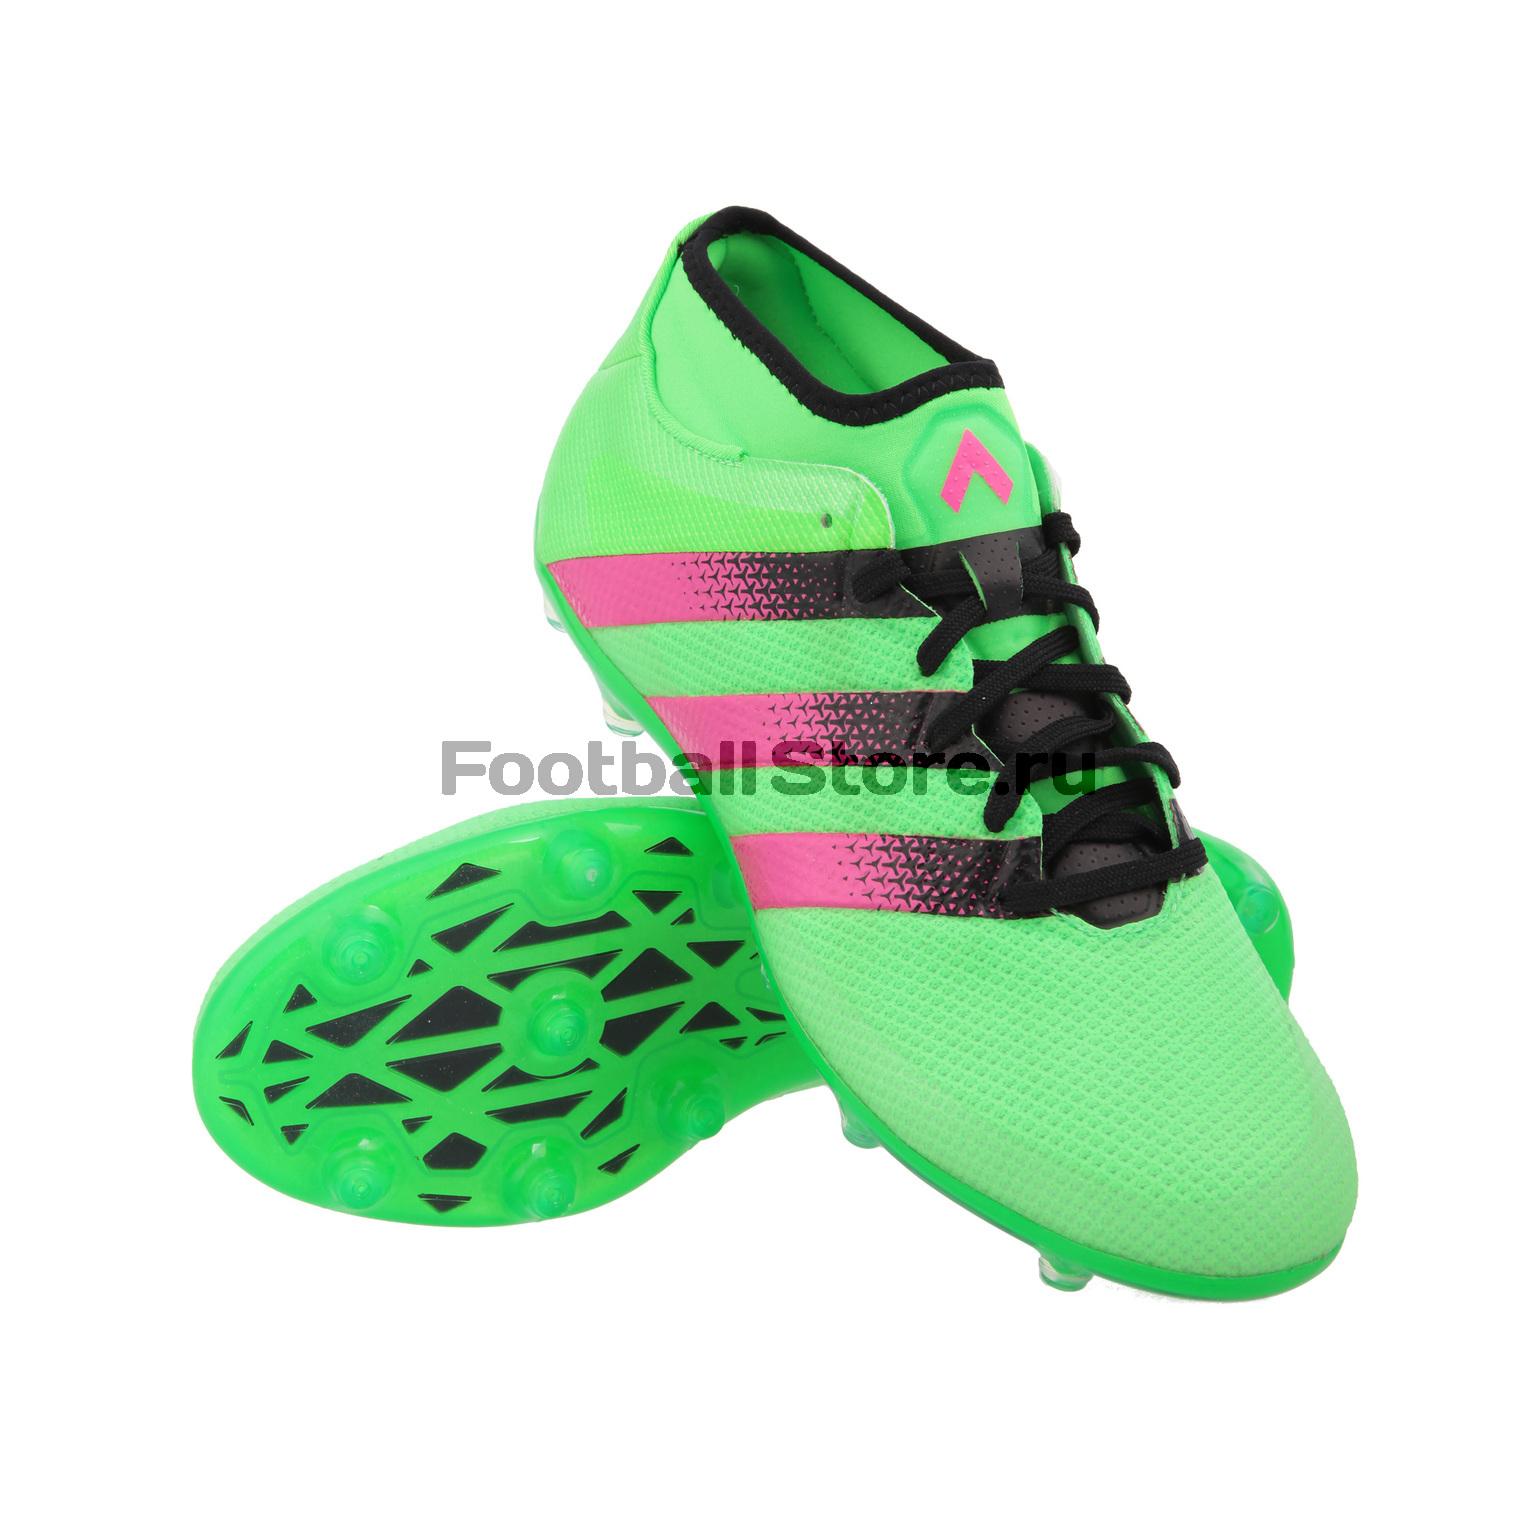 11ad5e9f35ef Бутсы adidas ACE 16.2 Prime Mesh FG AG AQ2552 – купить бутсы в ...